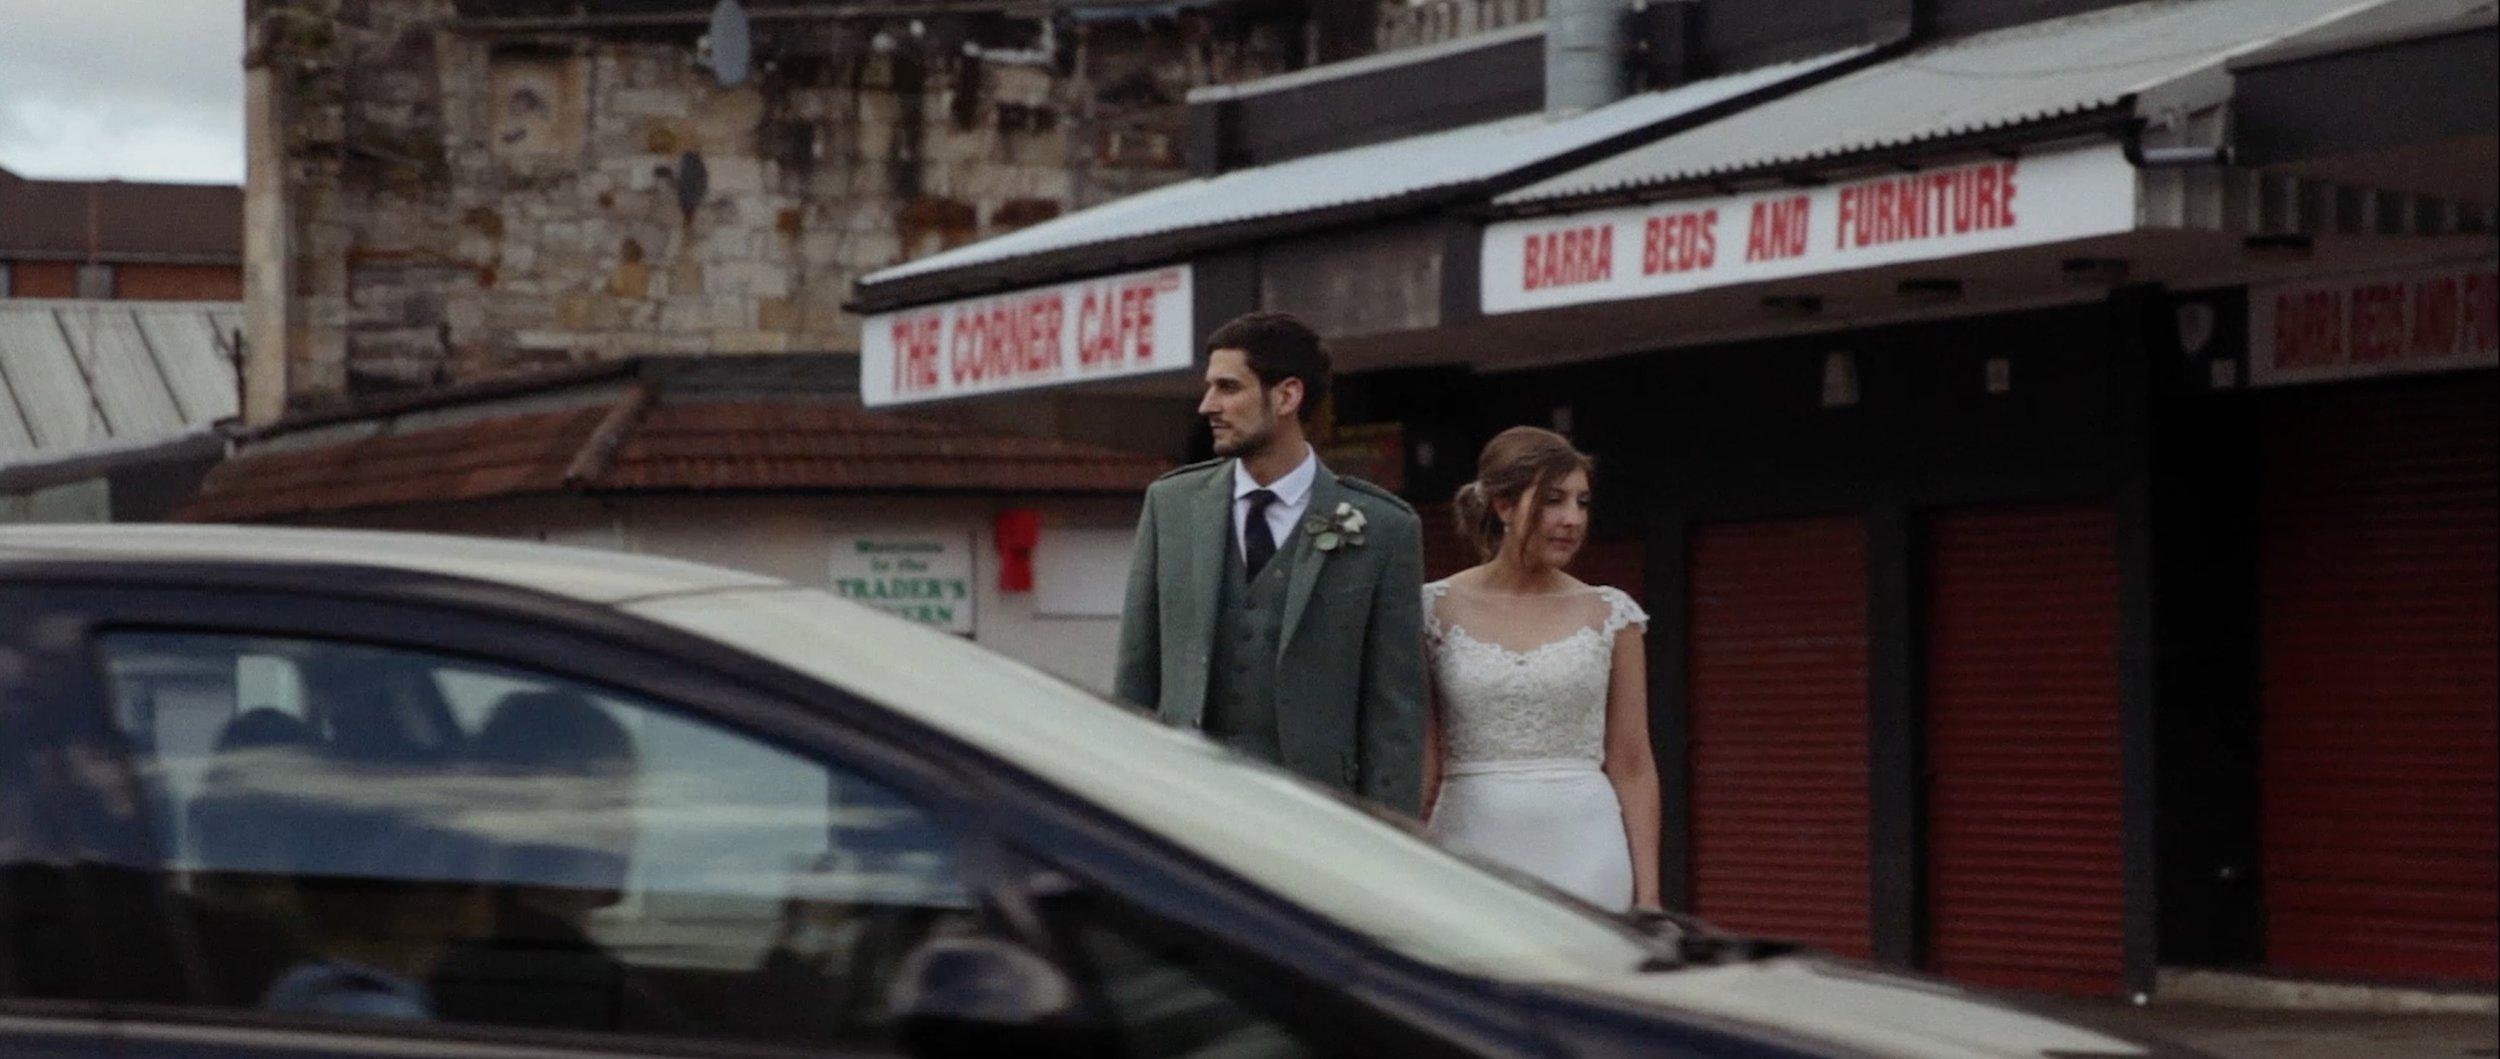 perthshire-wedding-videographer_LL_05.jpg